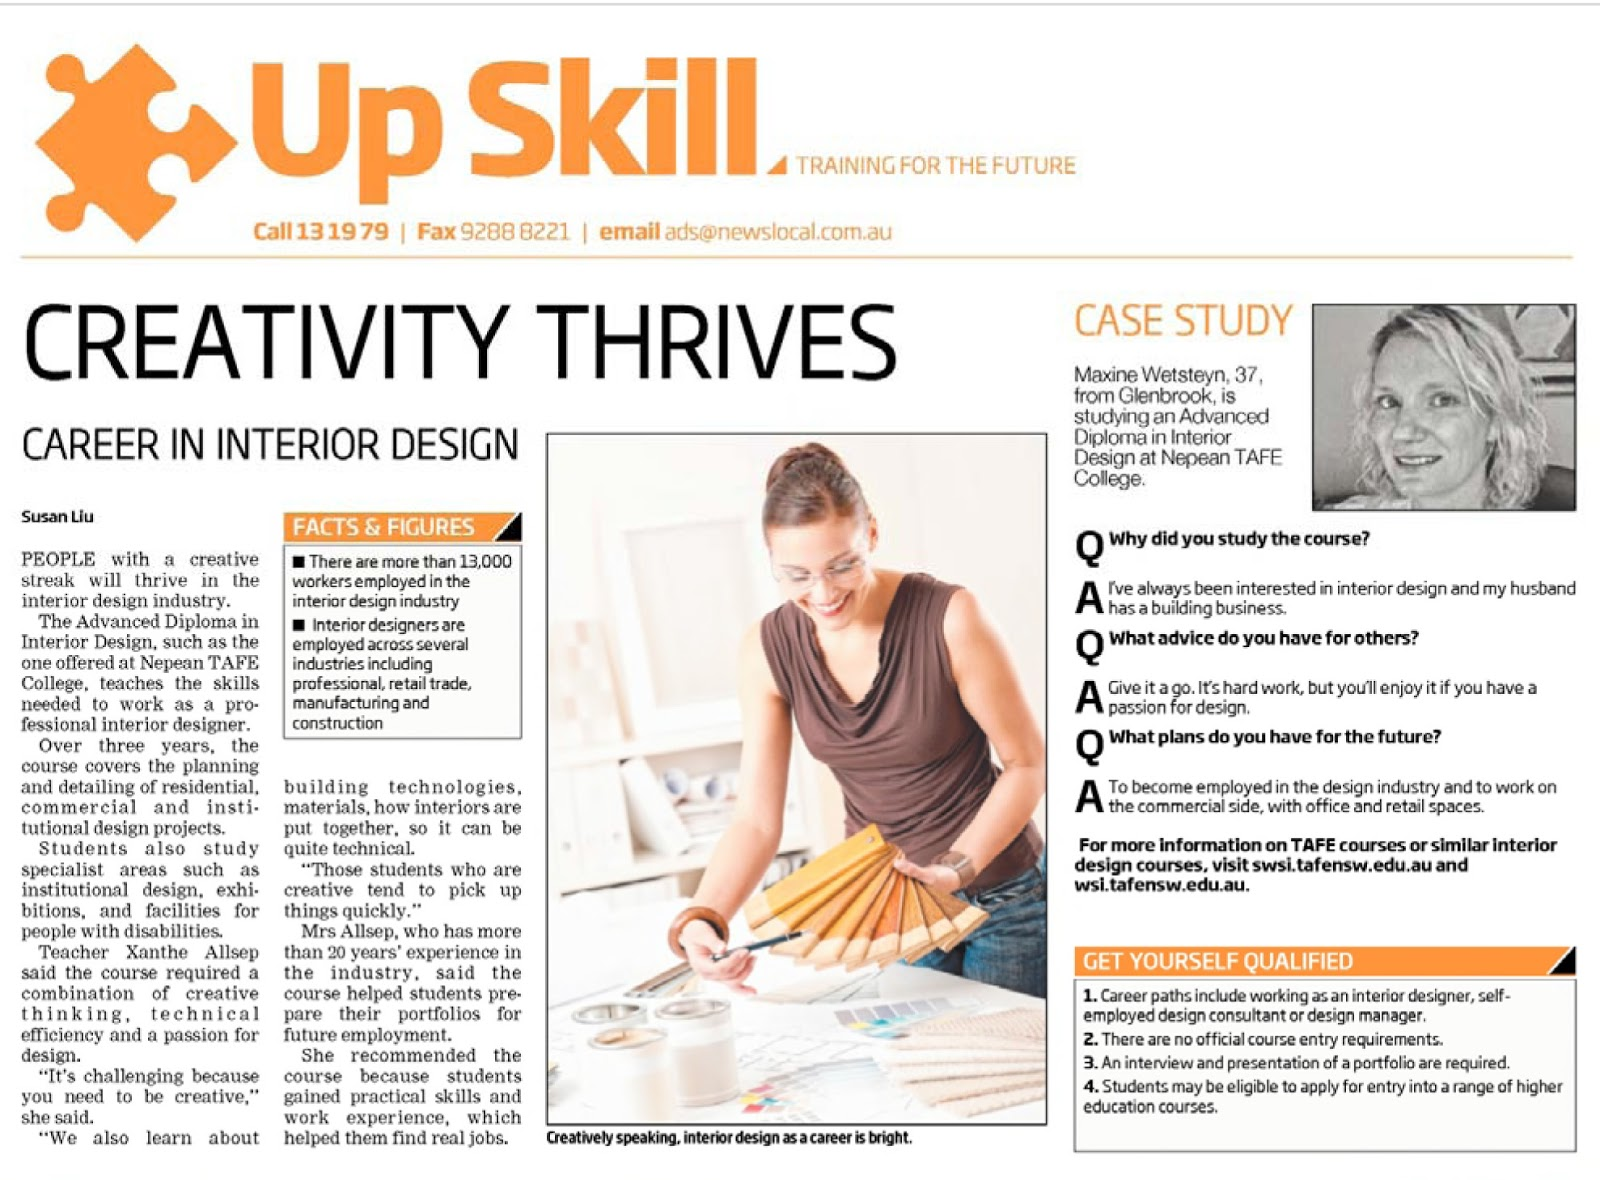 WSI Design Creativity Thrives in Interior Design